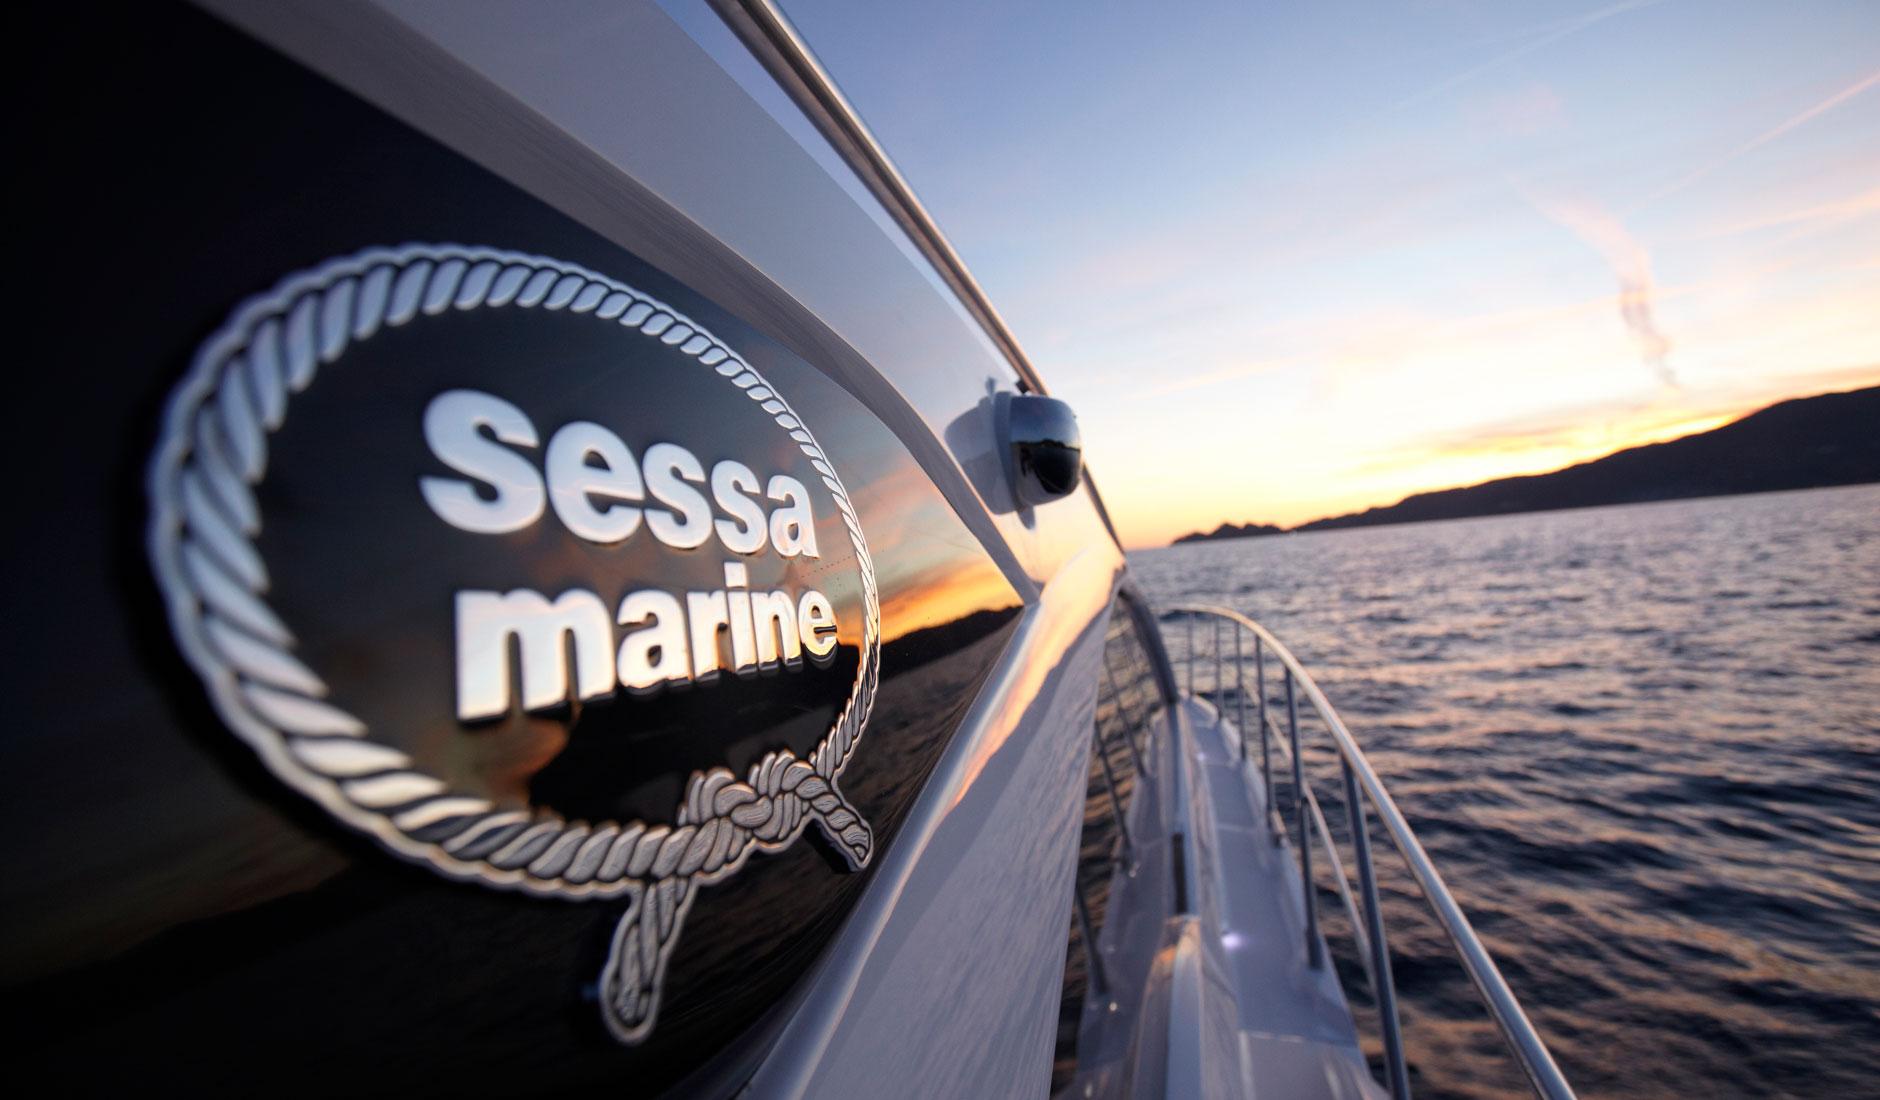 Sessa Marine C 48 Фото № 6